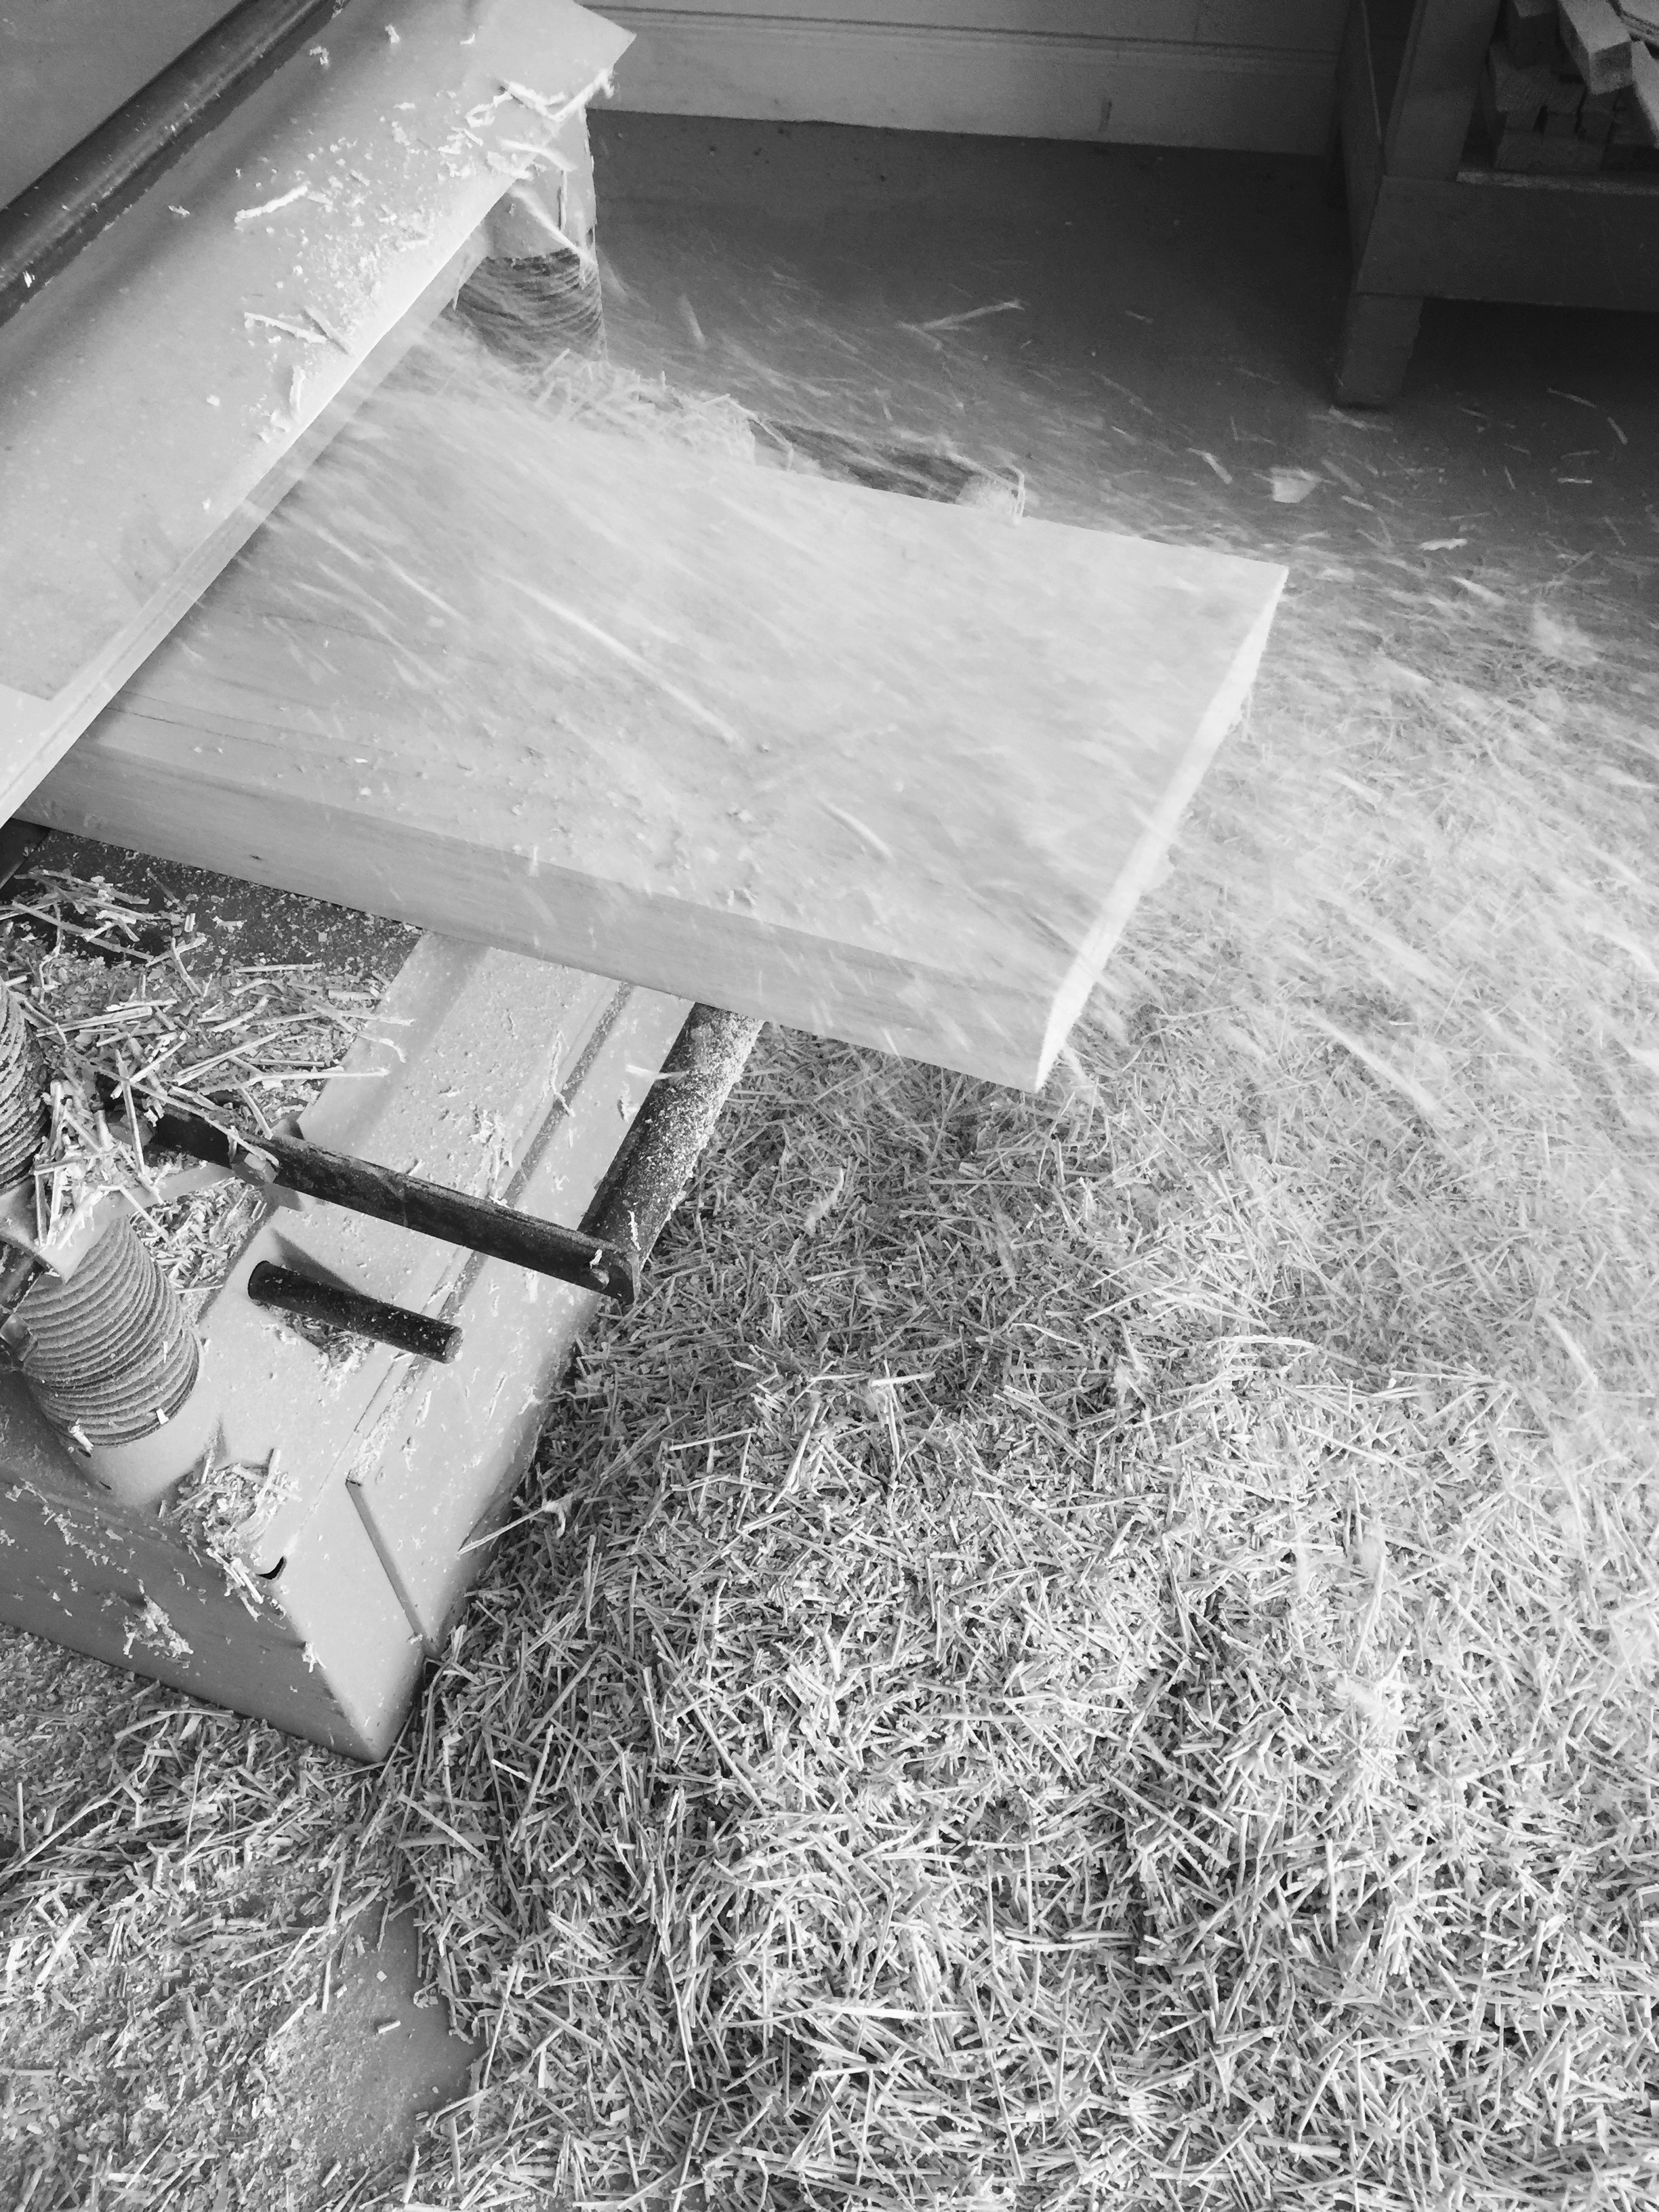 wood shop planer in action